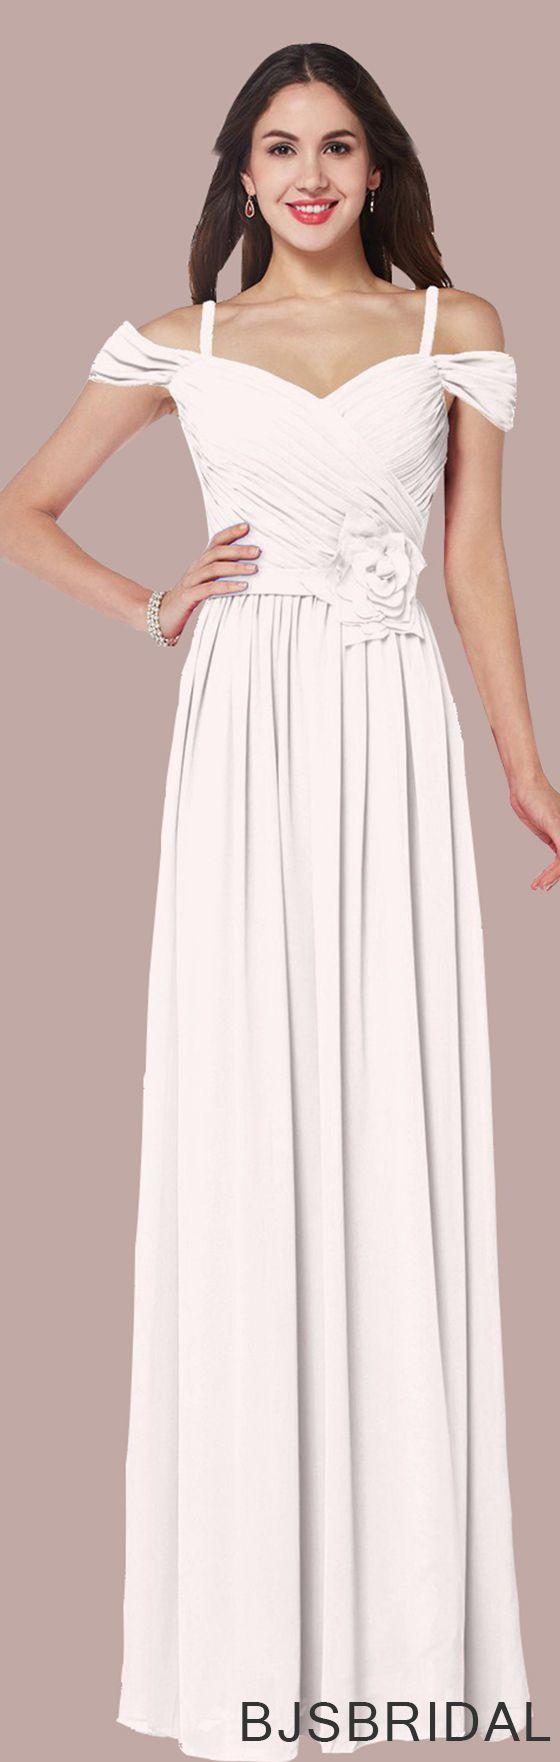 d0e15efbb62d Light Pink Bridesmaid Dress - Gorgeous A-line Off-the-Shoulder Short ...